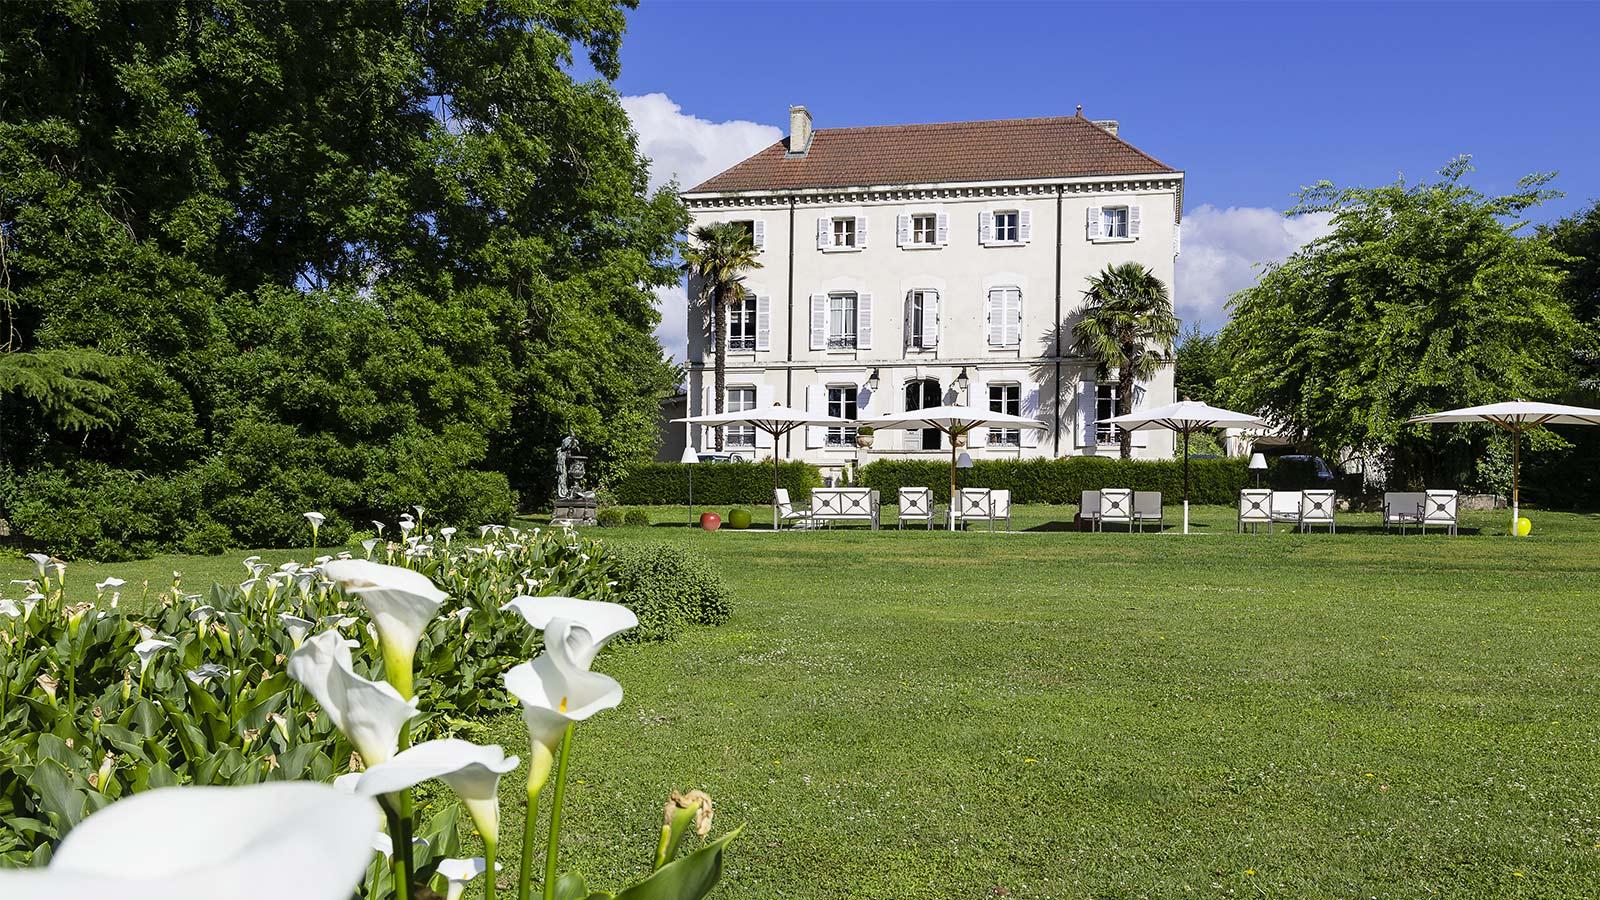 Hotel Domaine de Clairefontaine